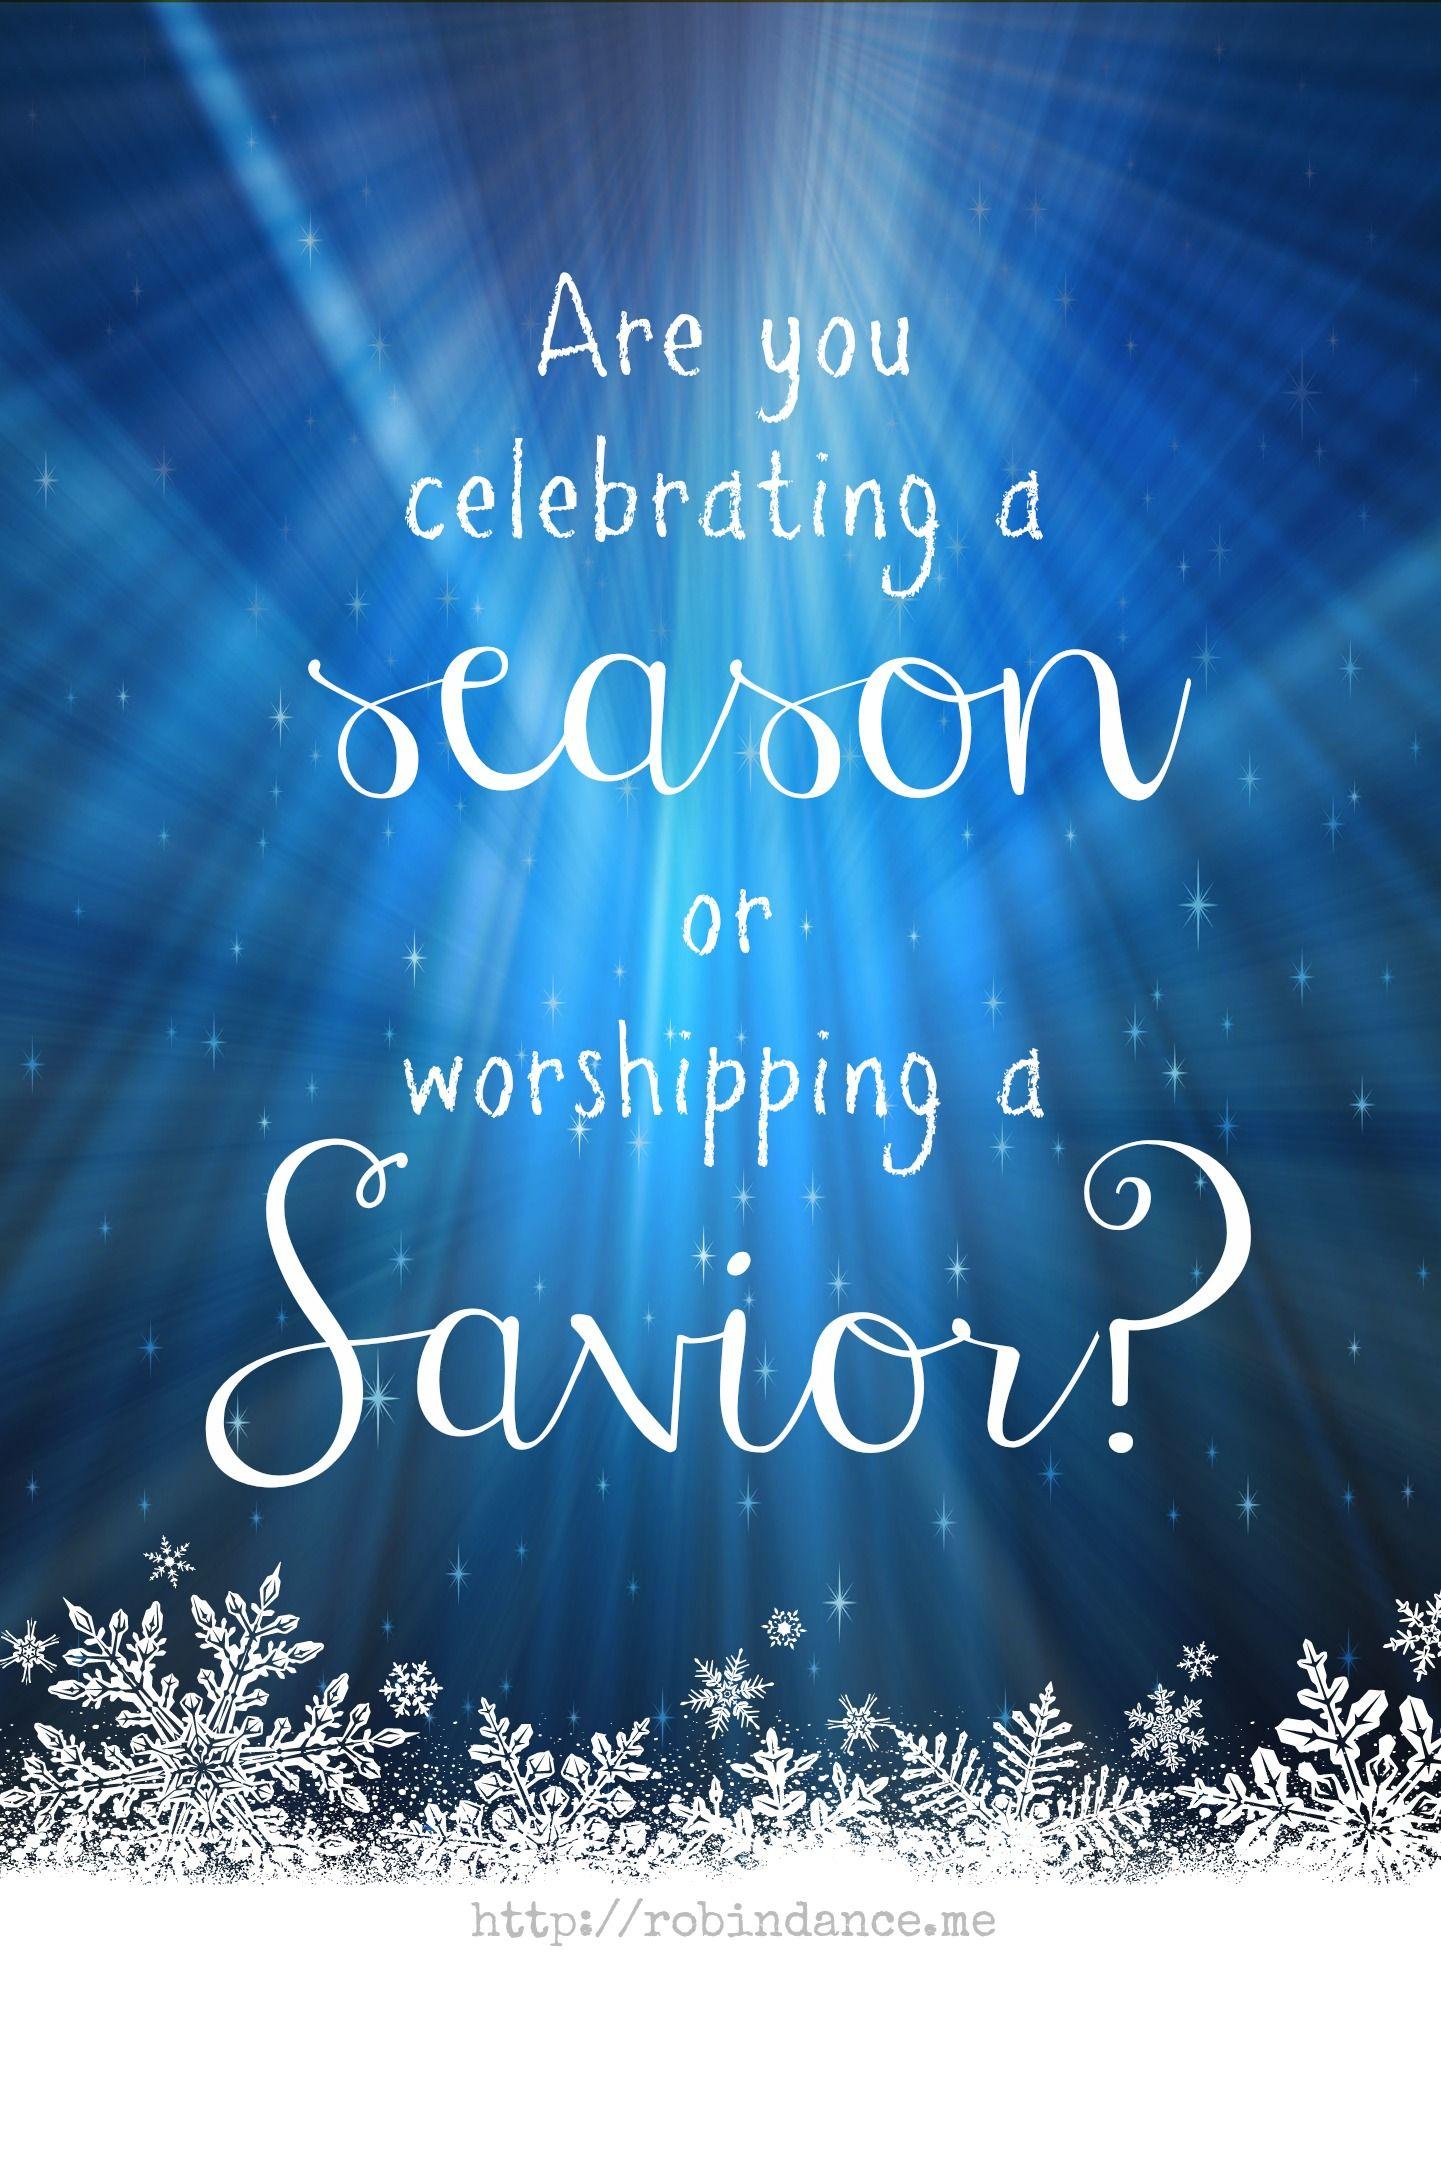 Are You Celebrating A Season Or Worshipping Savior Question From Robindance Christmas SayingsChristmas